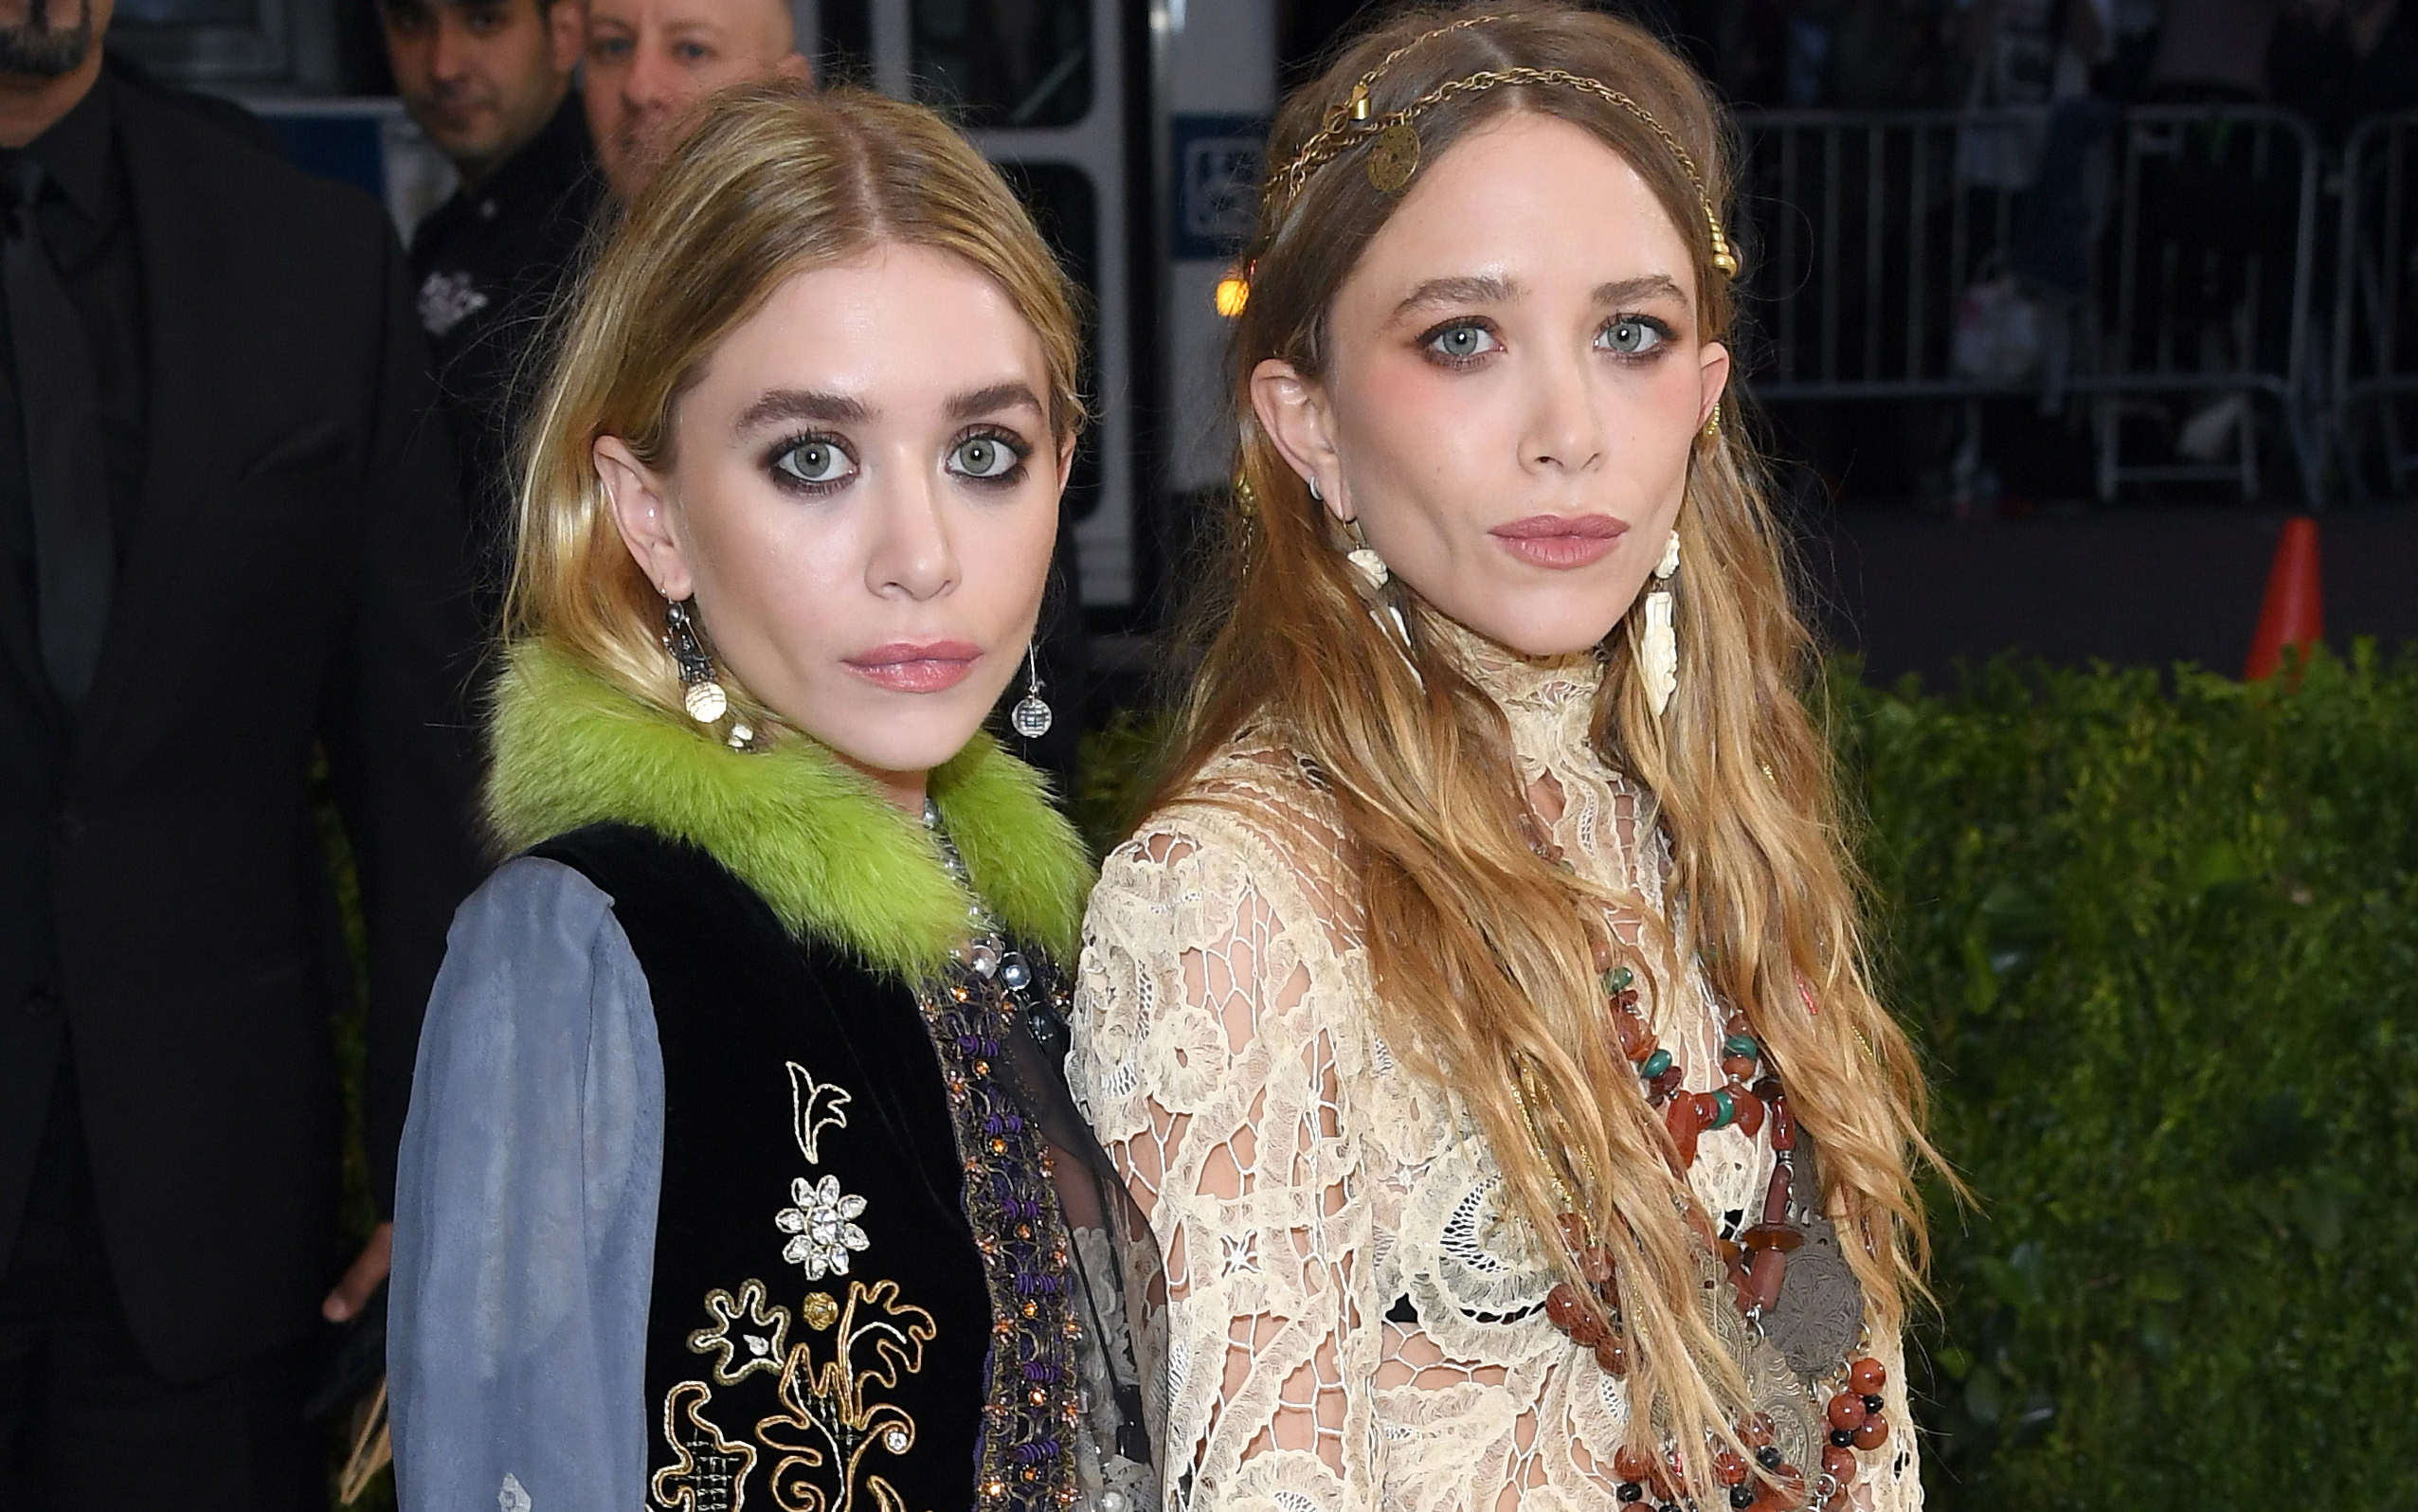 Olsen Twins naked 21